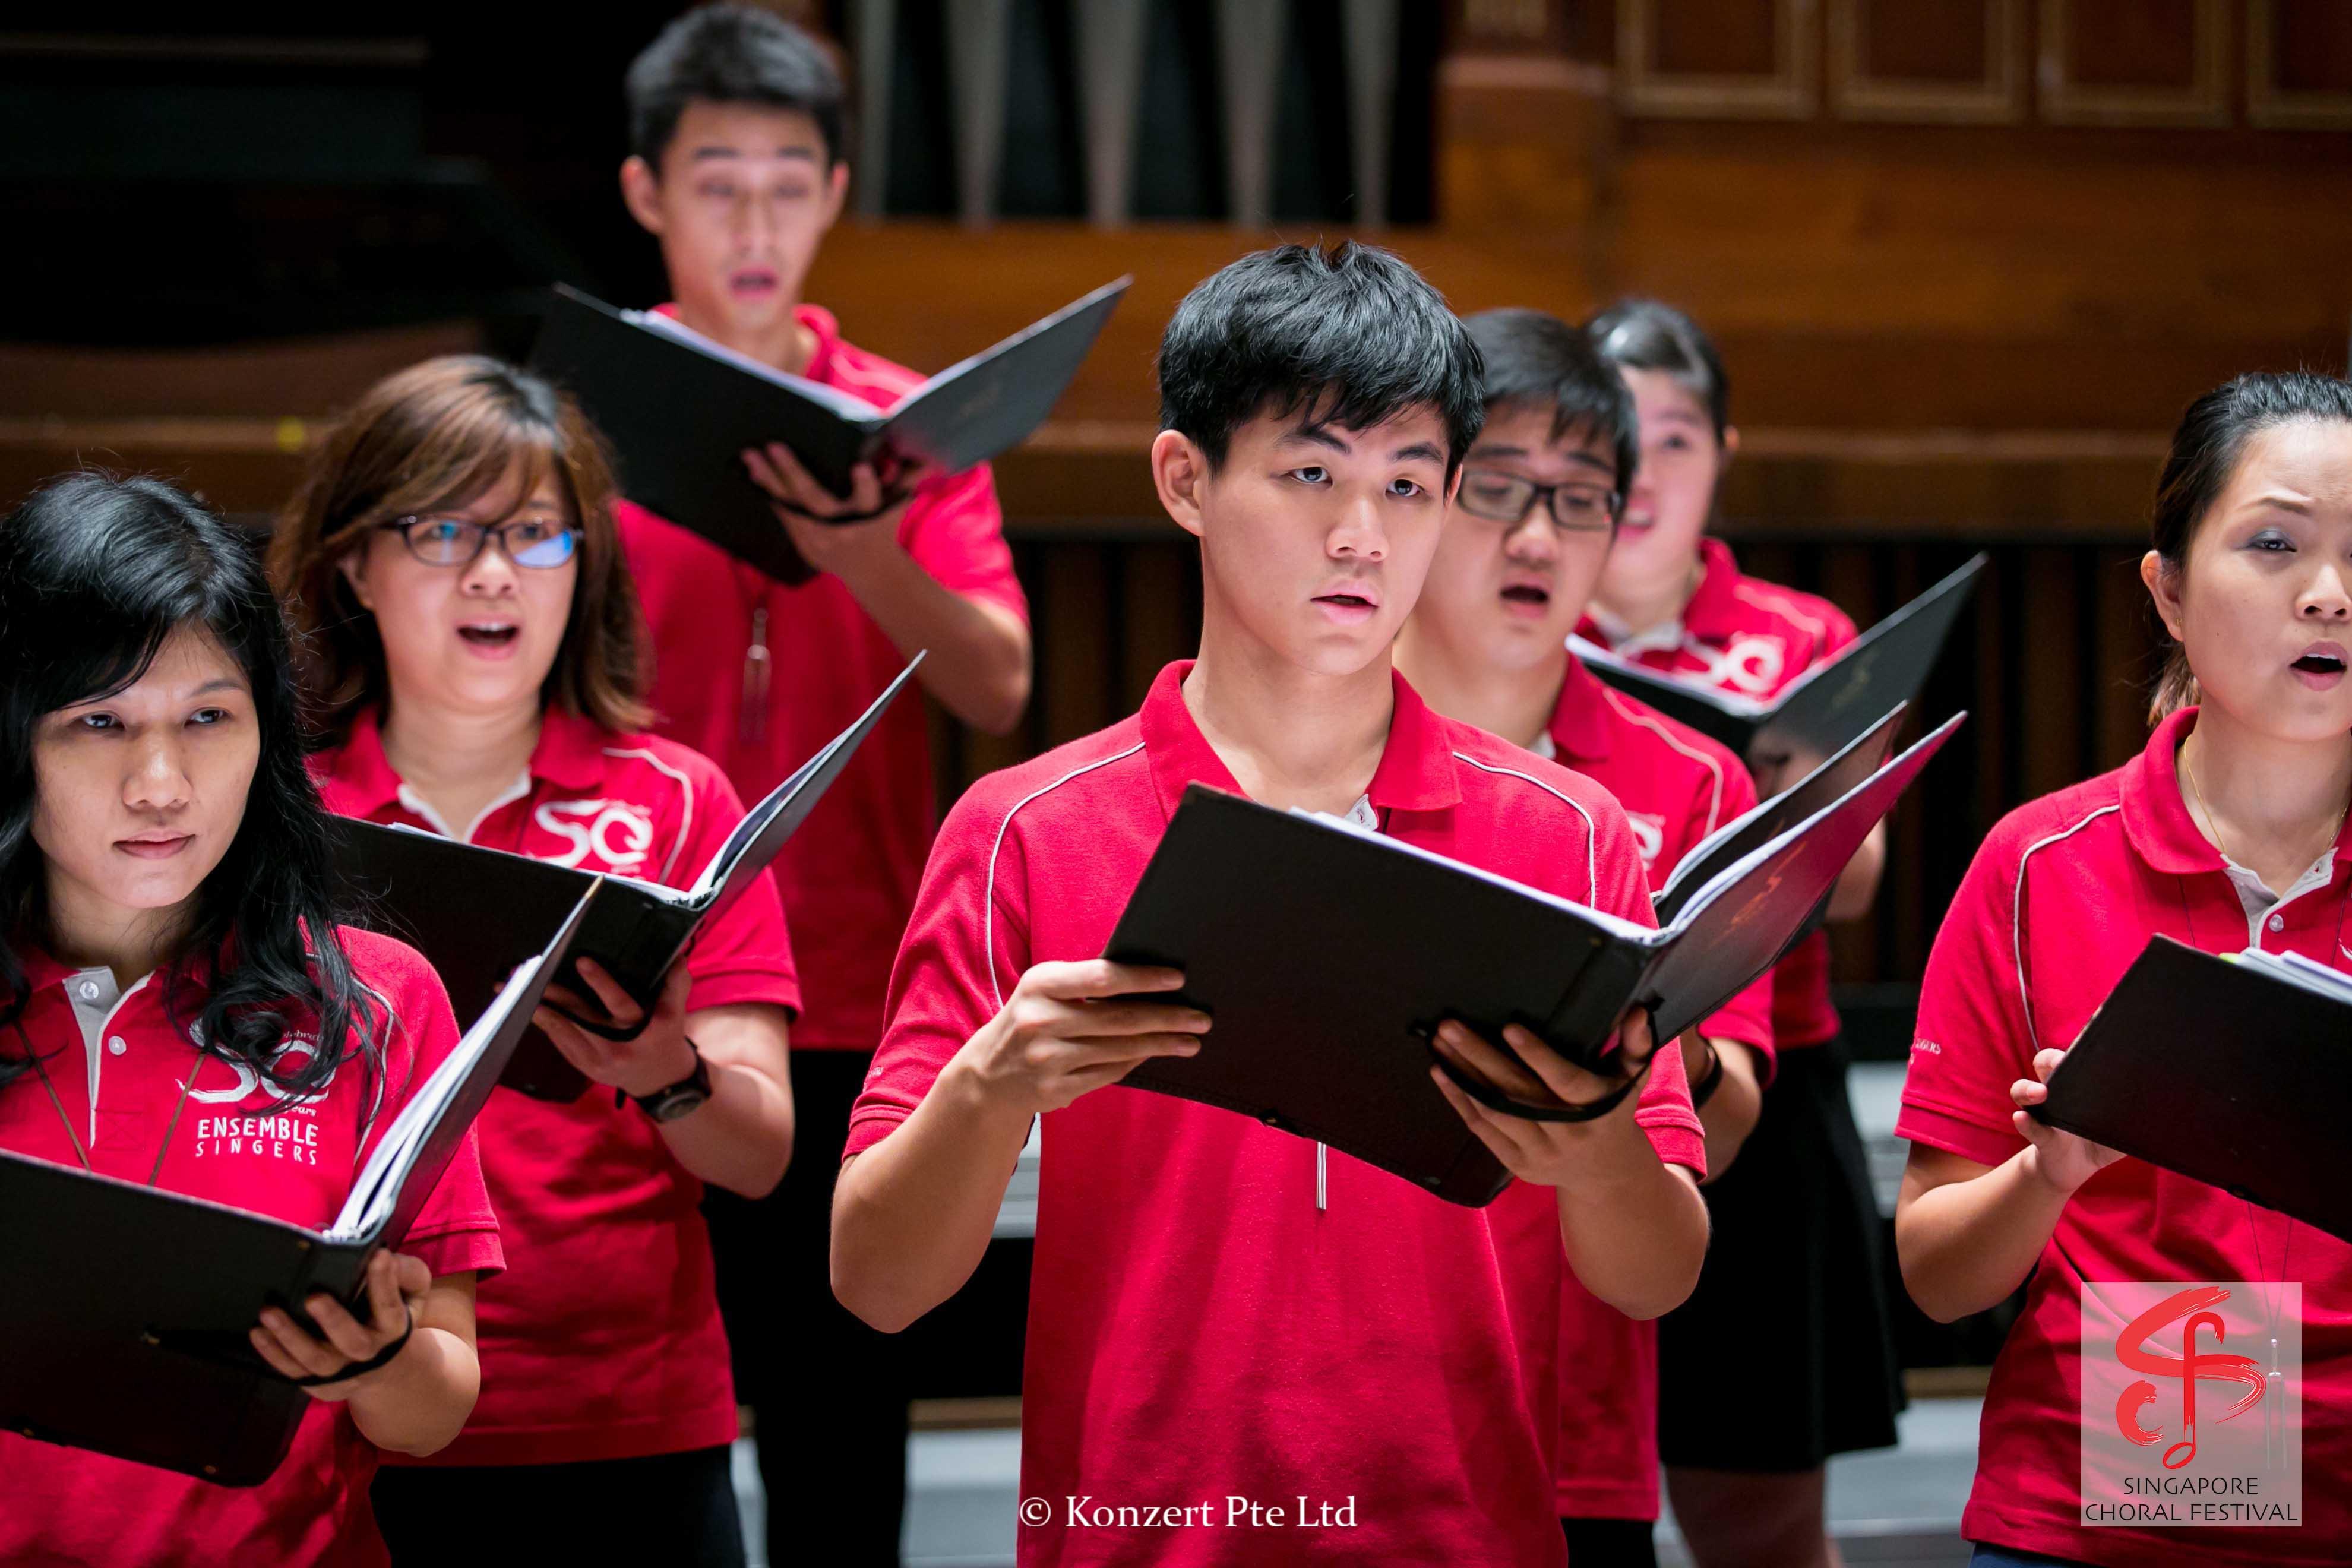 Singapore Choral Festival 8-8-15 (50).jpg